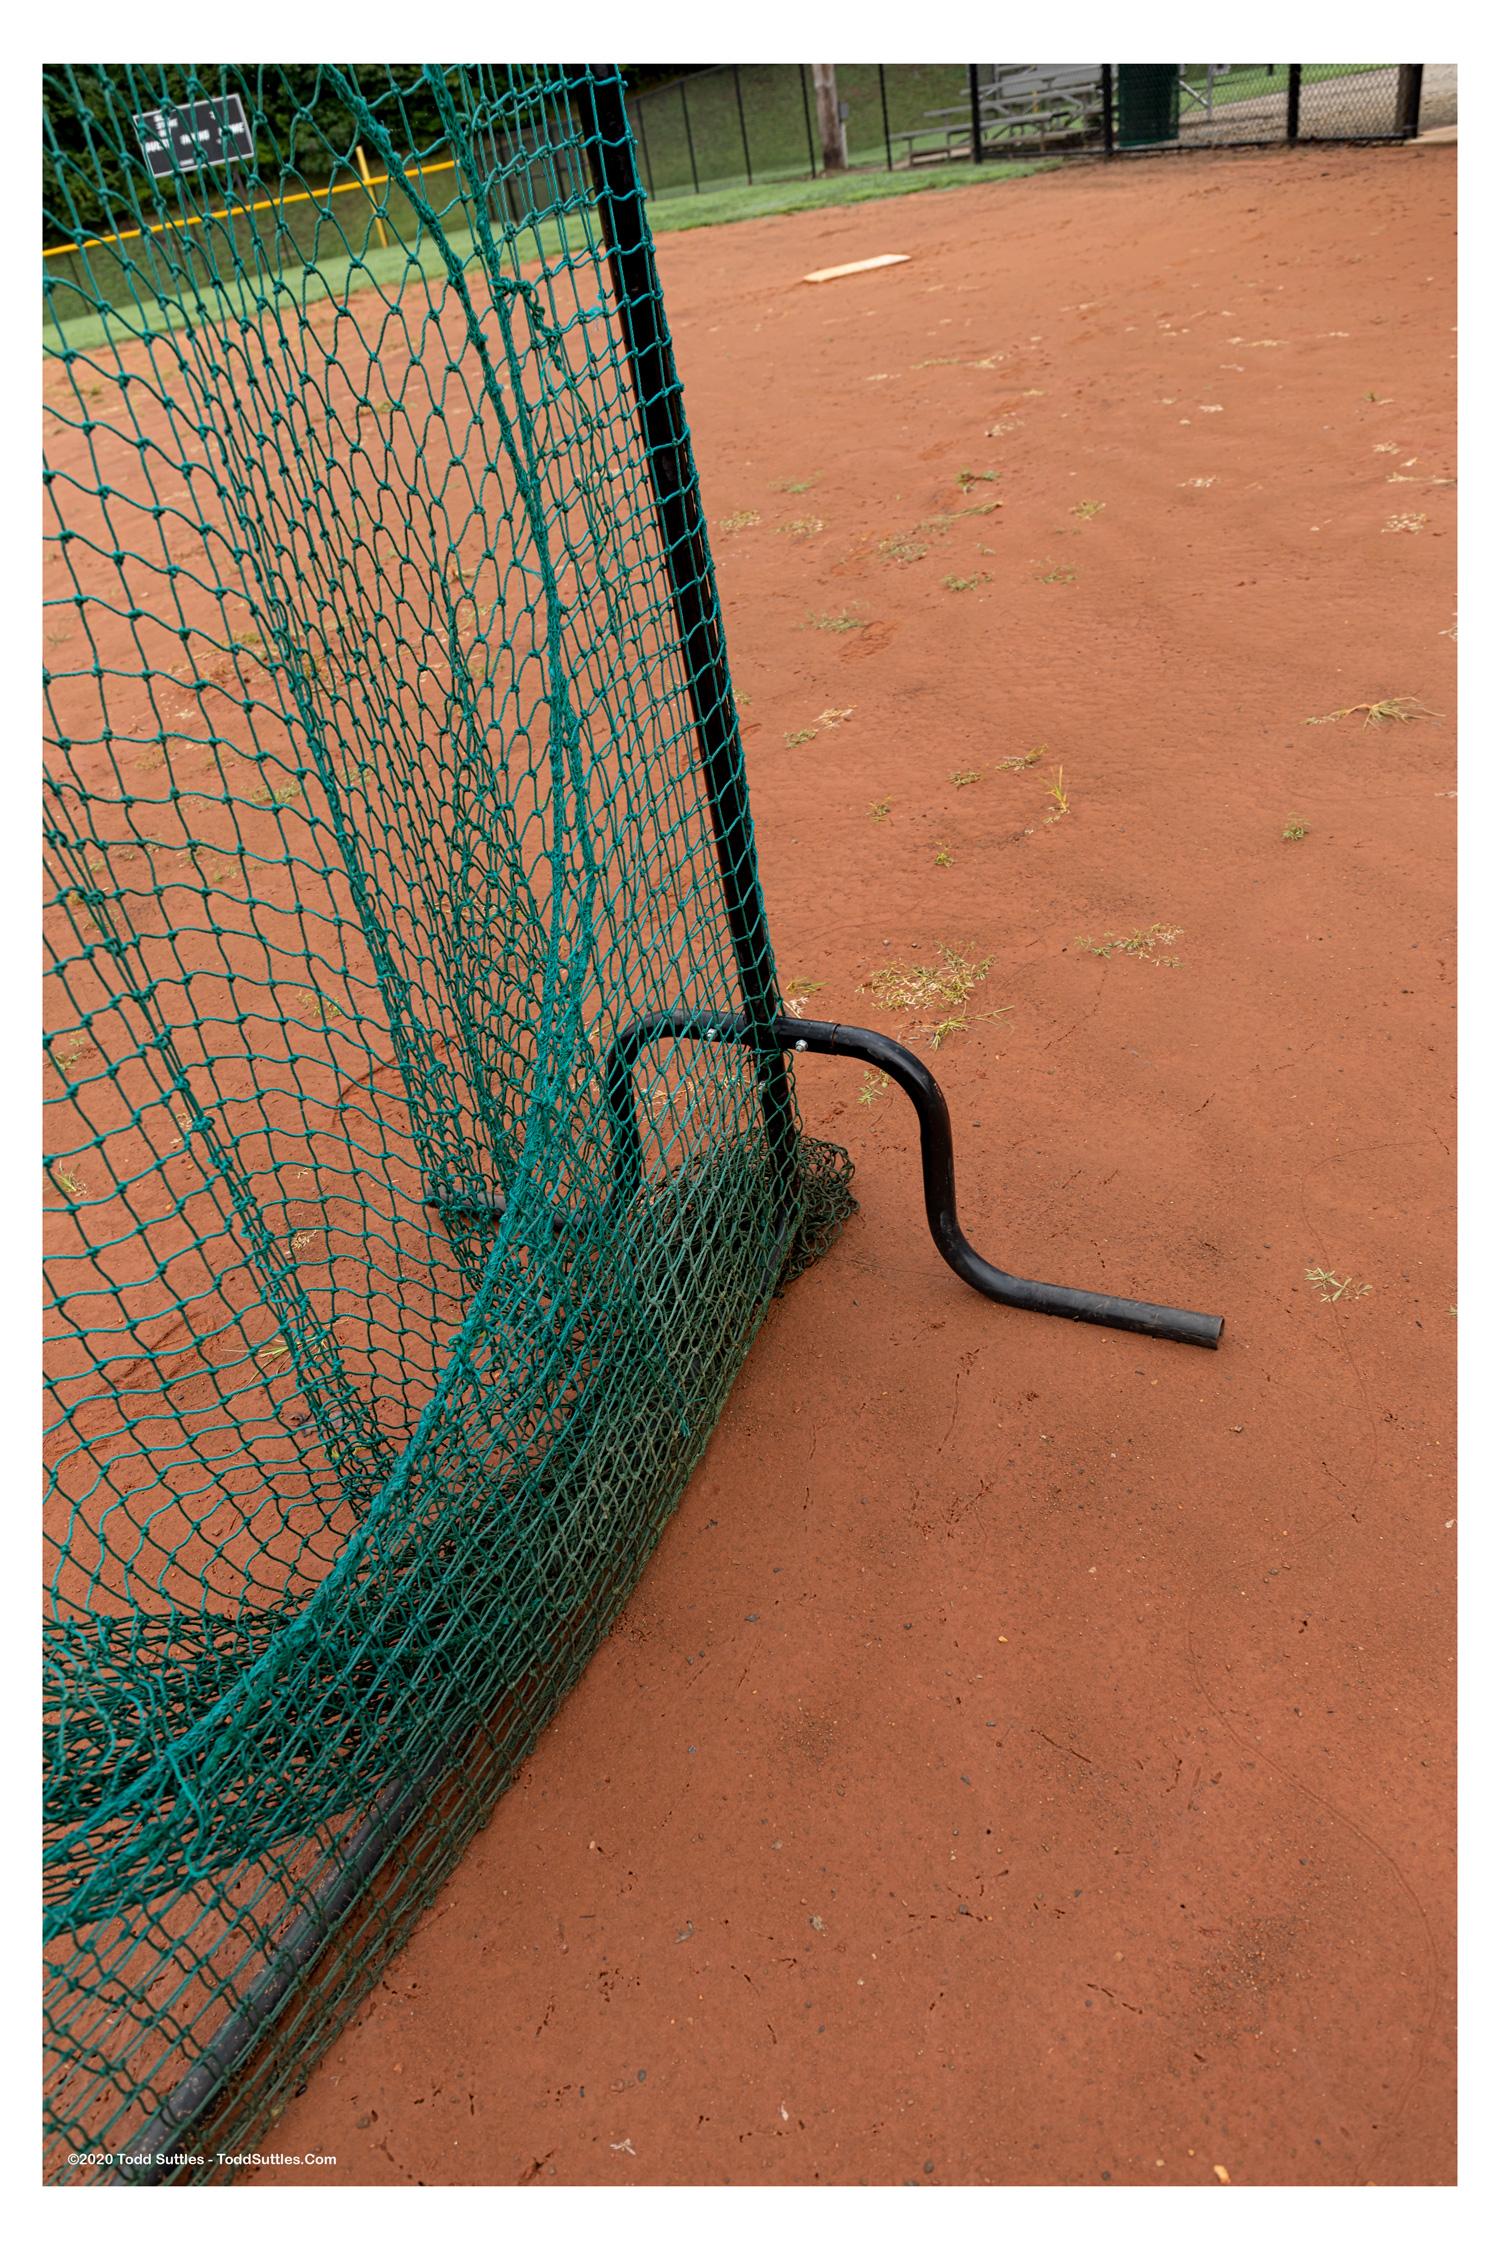 -Baseball_Two_16x24_78A5411-Border_Wm